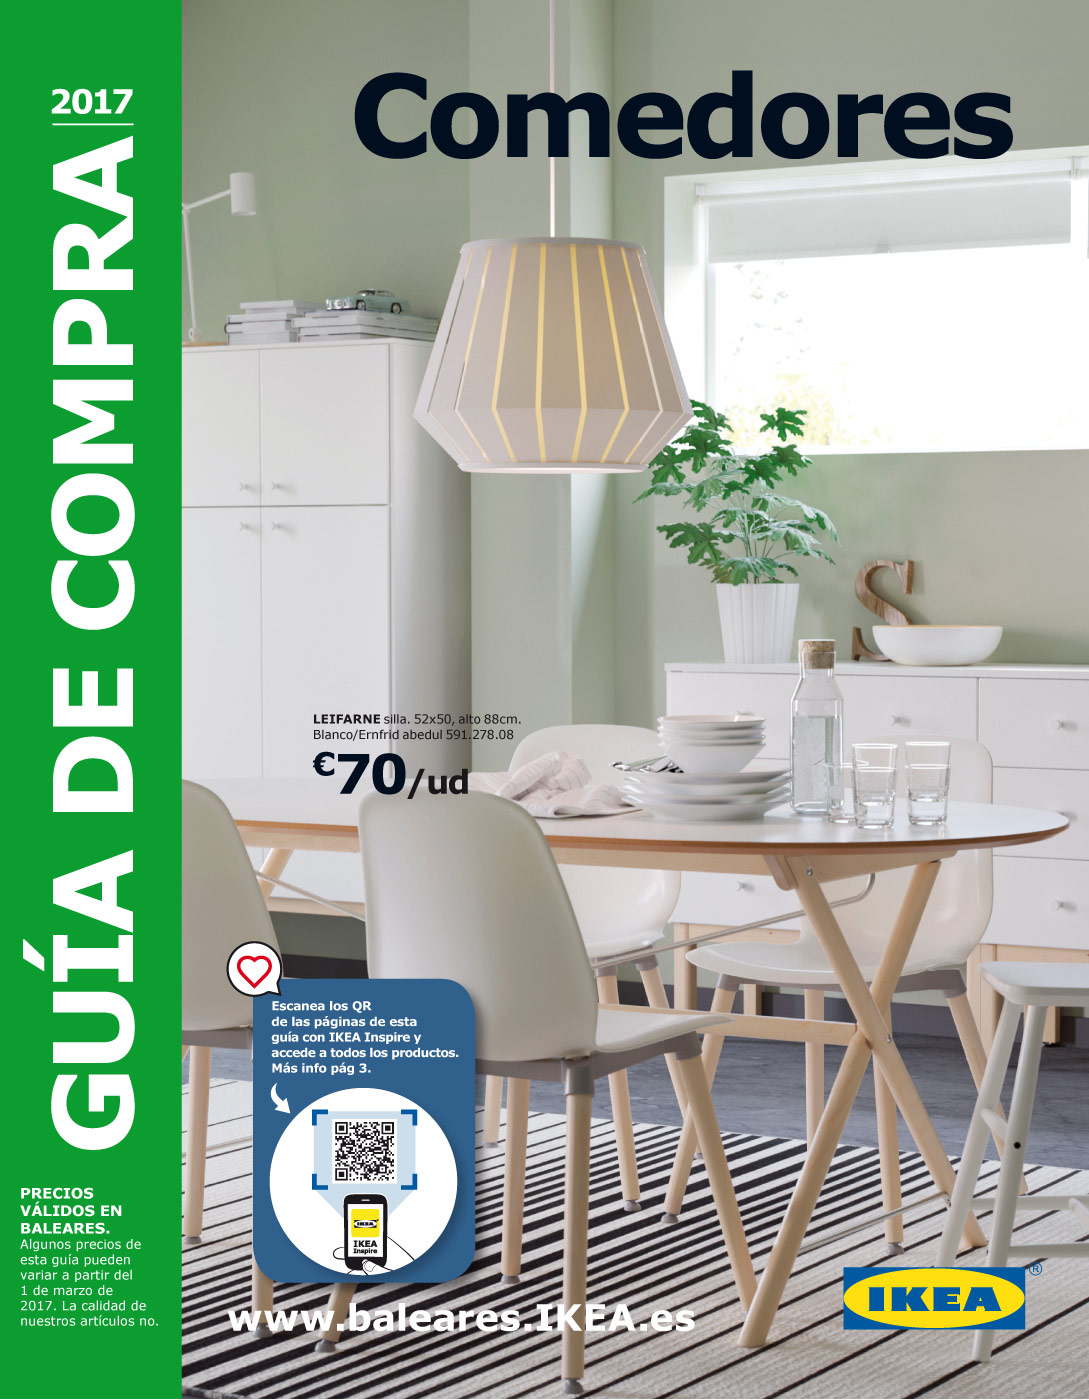 Comprar en ikea desde casa trendy compra online de sofs for Ikea compra online